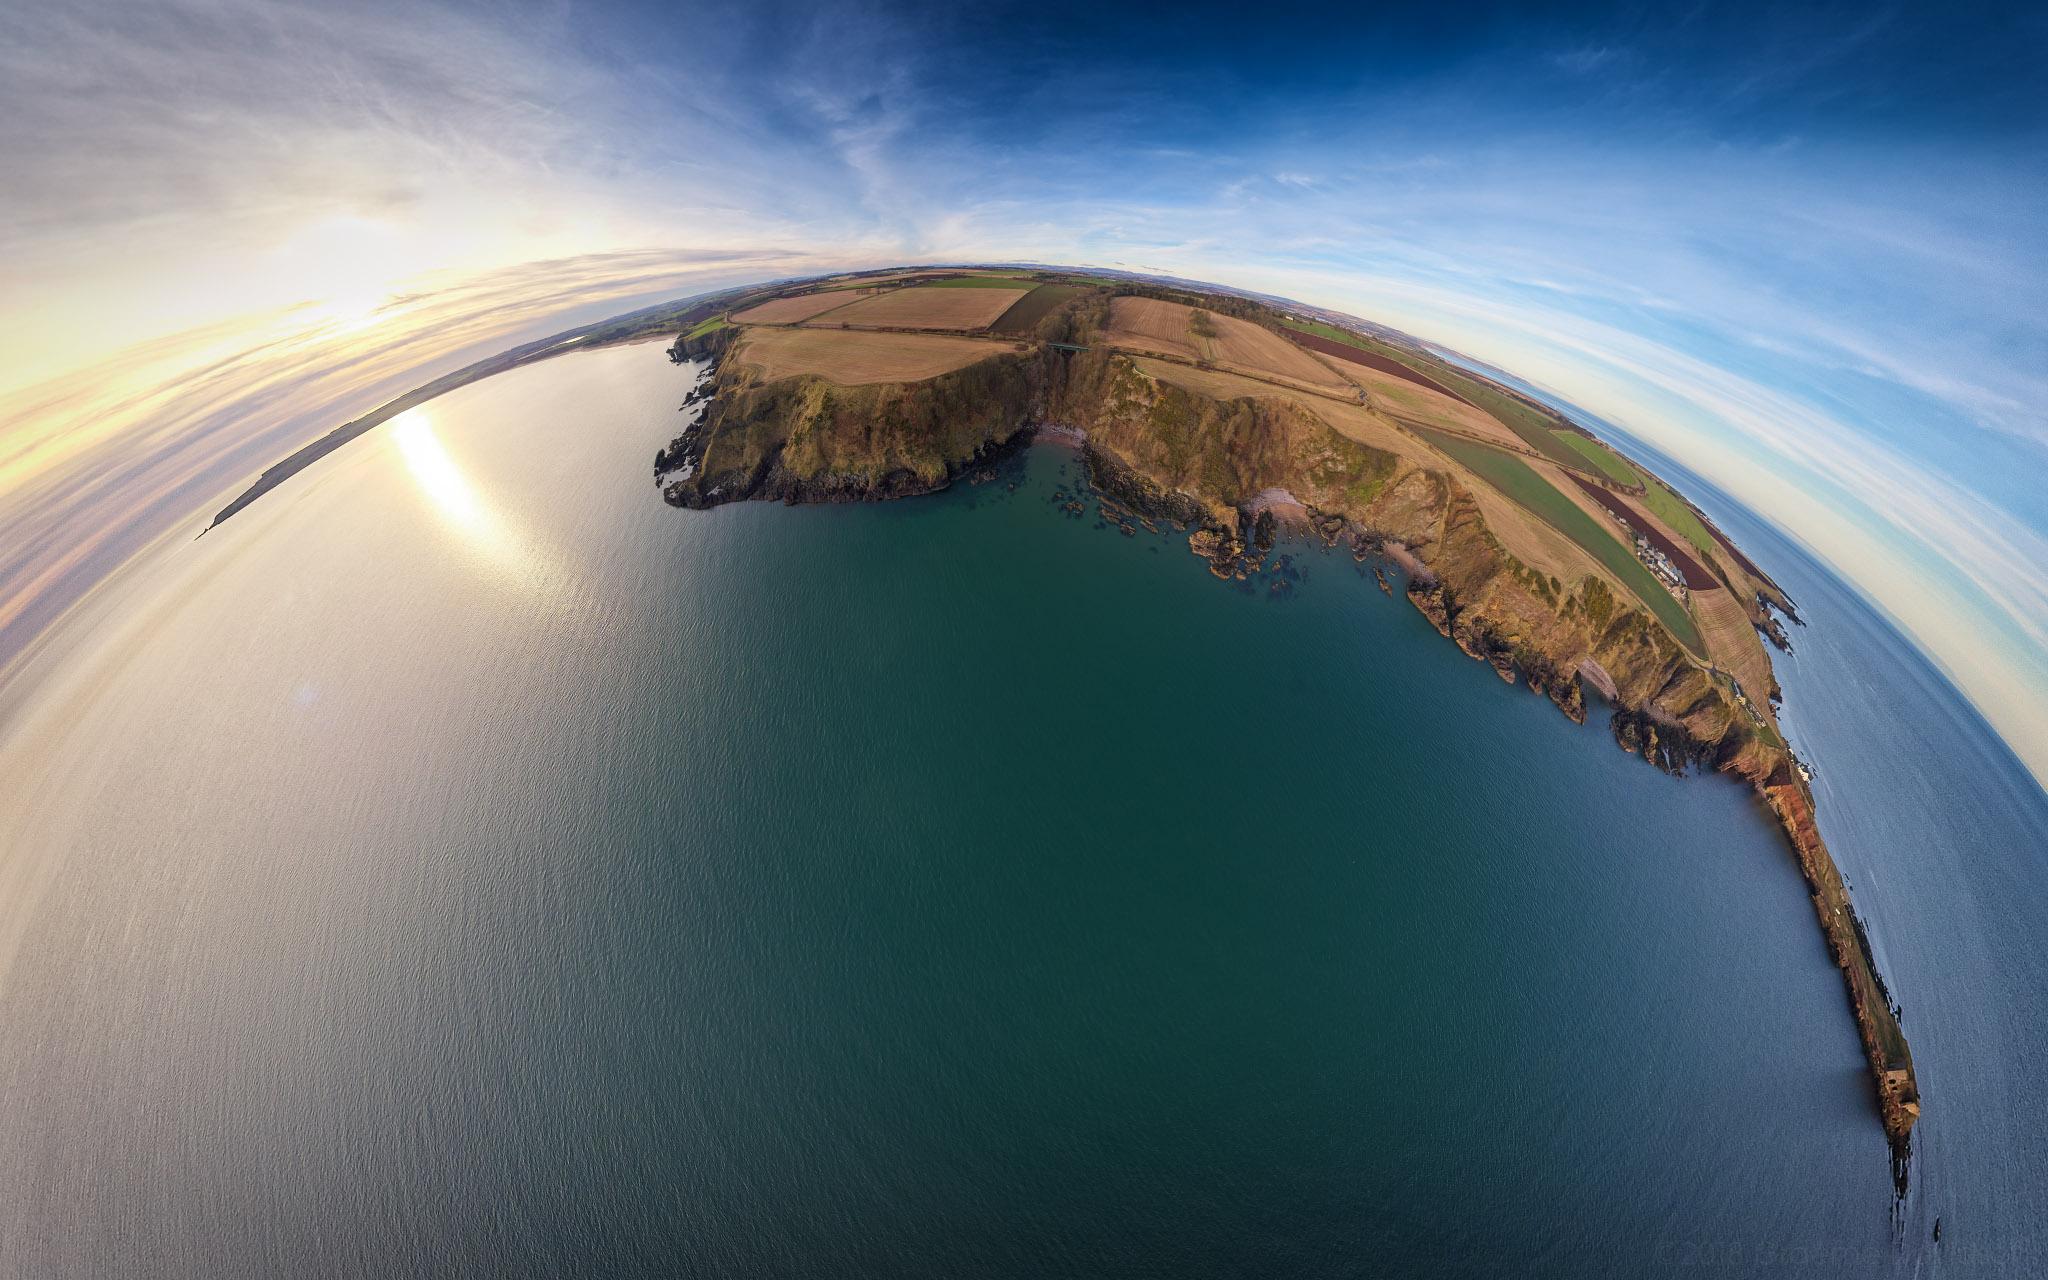 Auchmithie and Lunan Bay